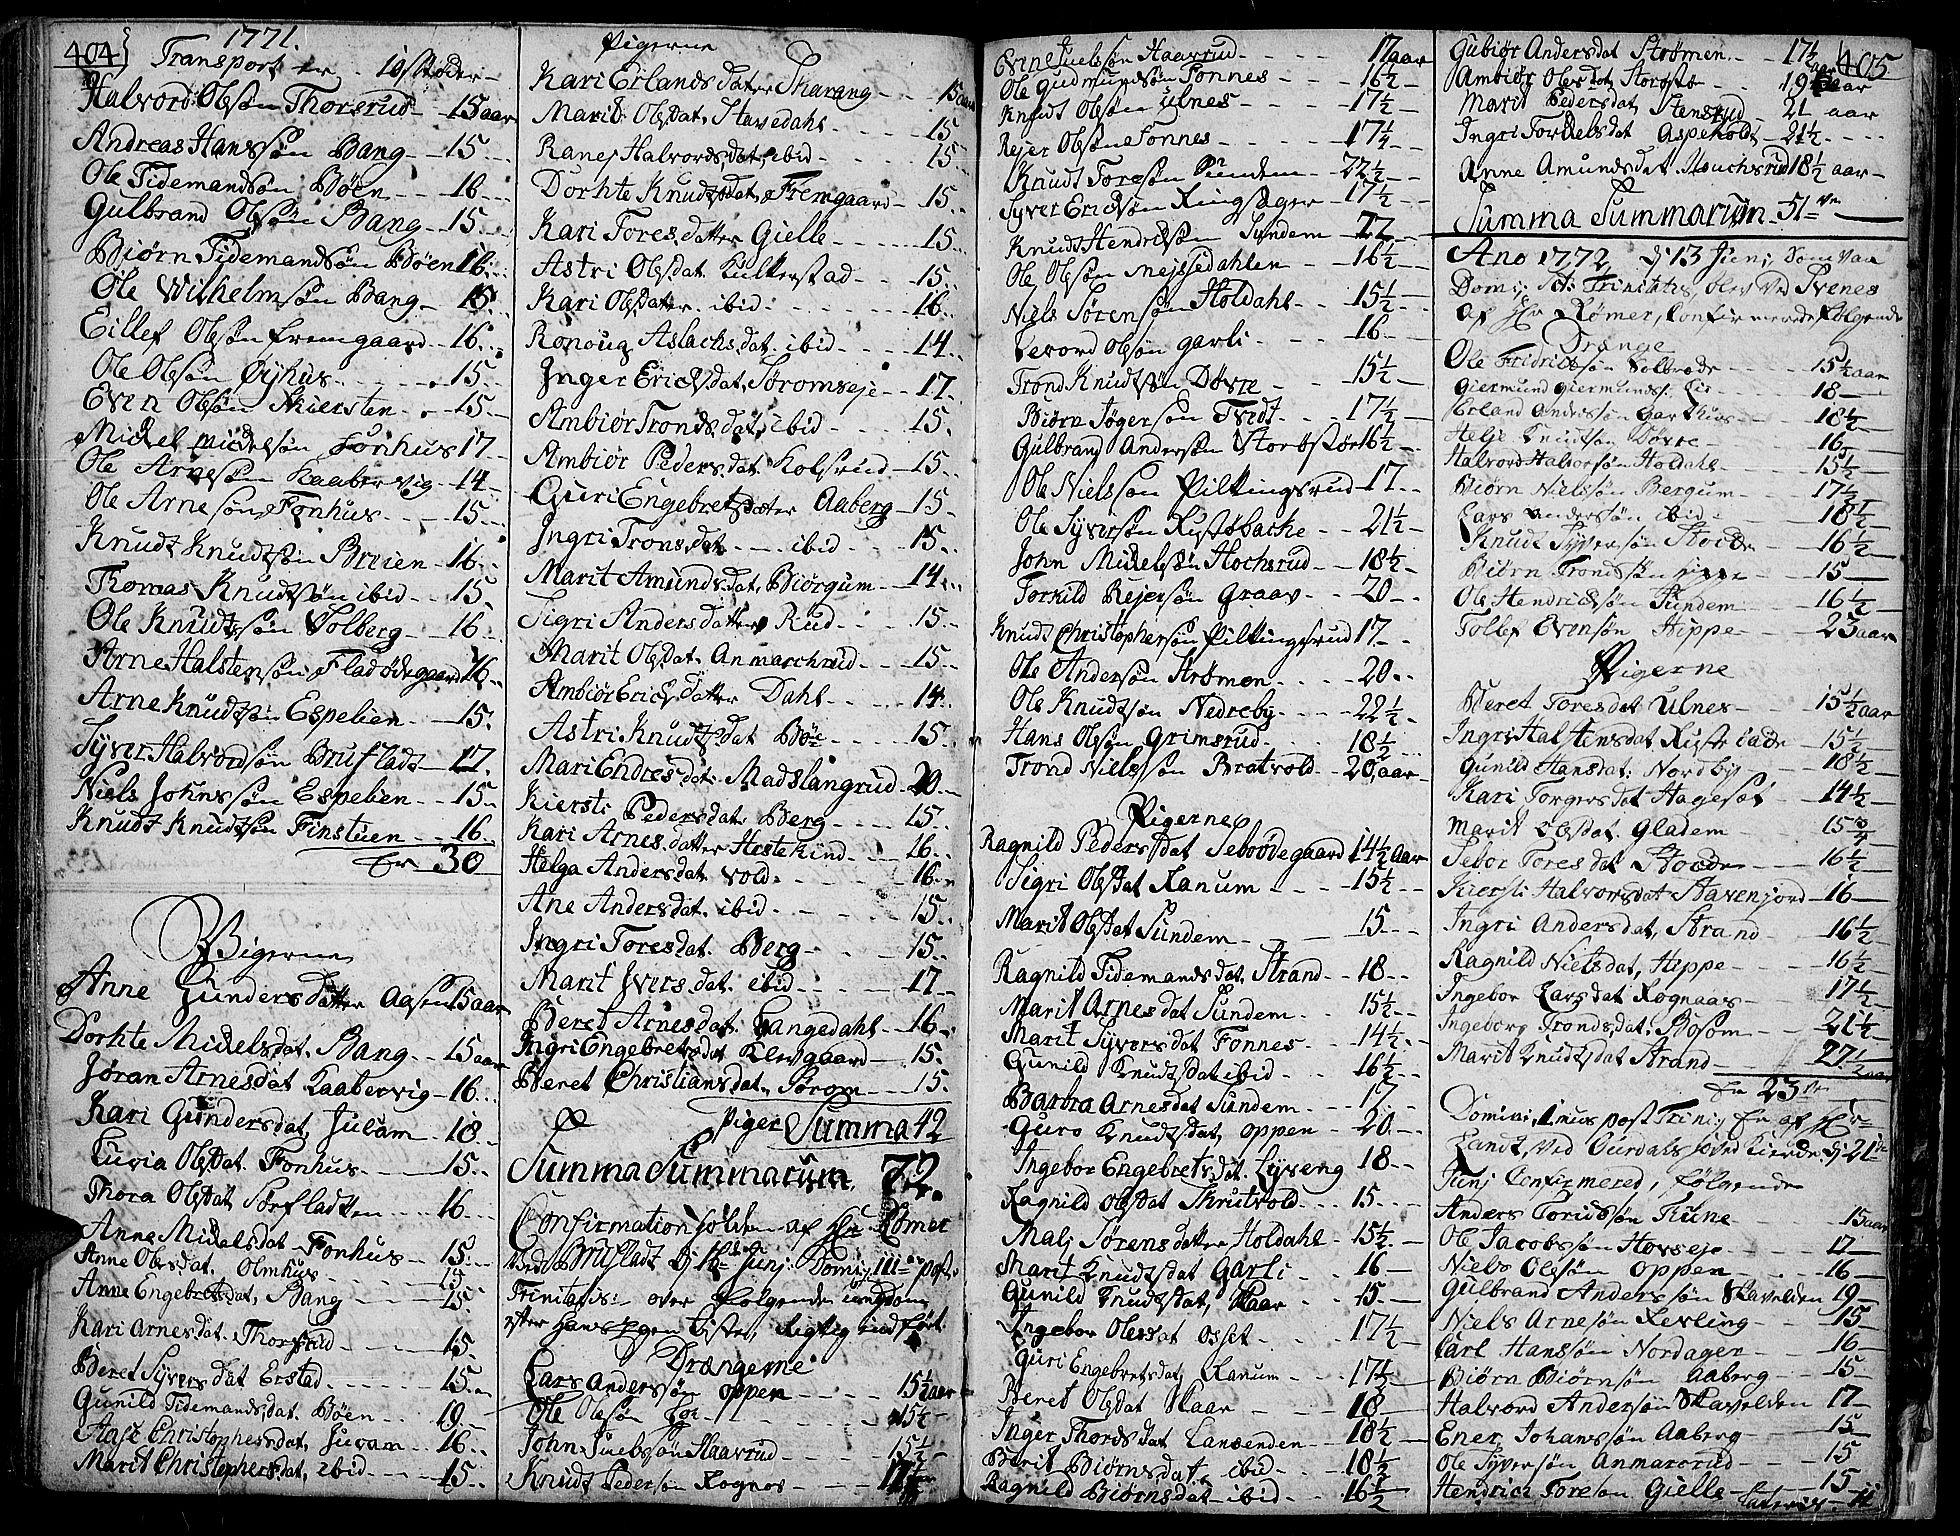 SAH, Aurdal prestekontor, Ministerialbok nr. 5, 1763-1781, s. 404-405